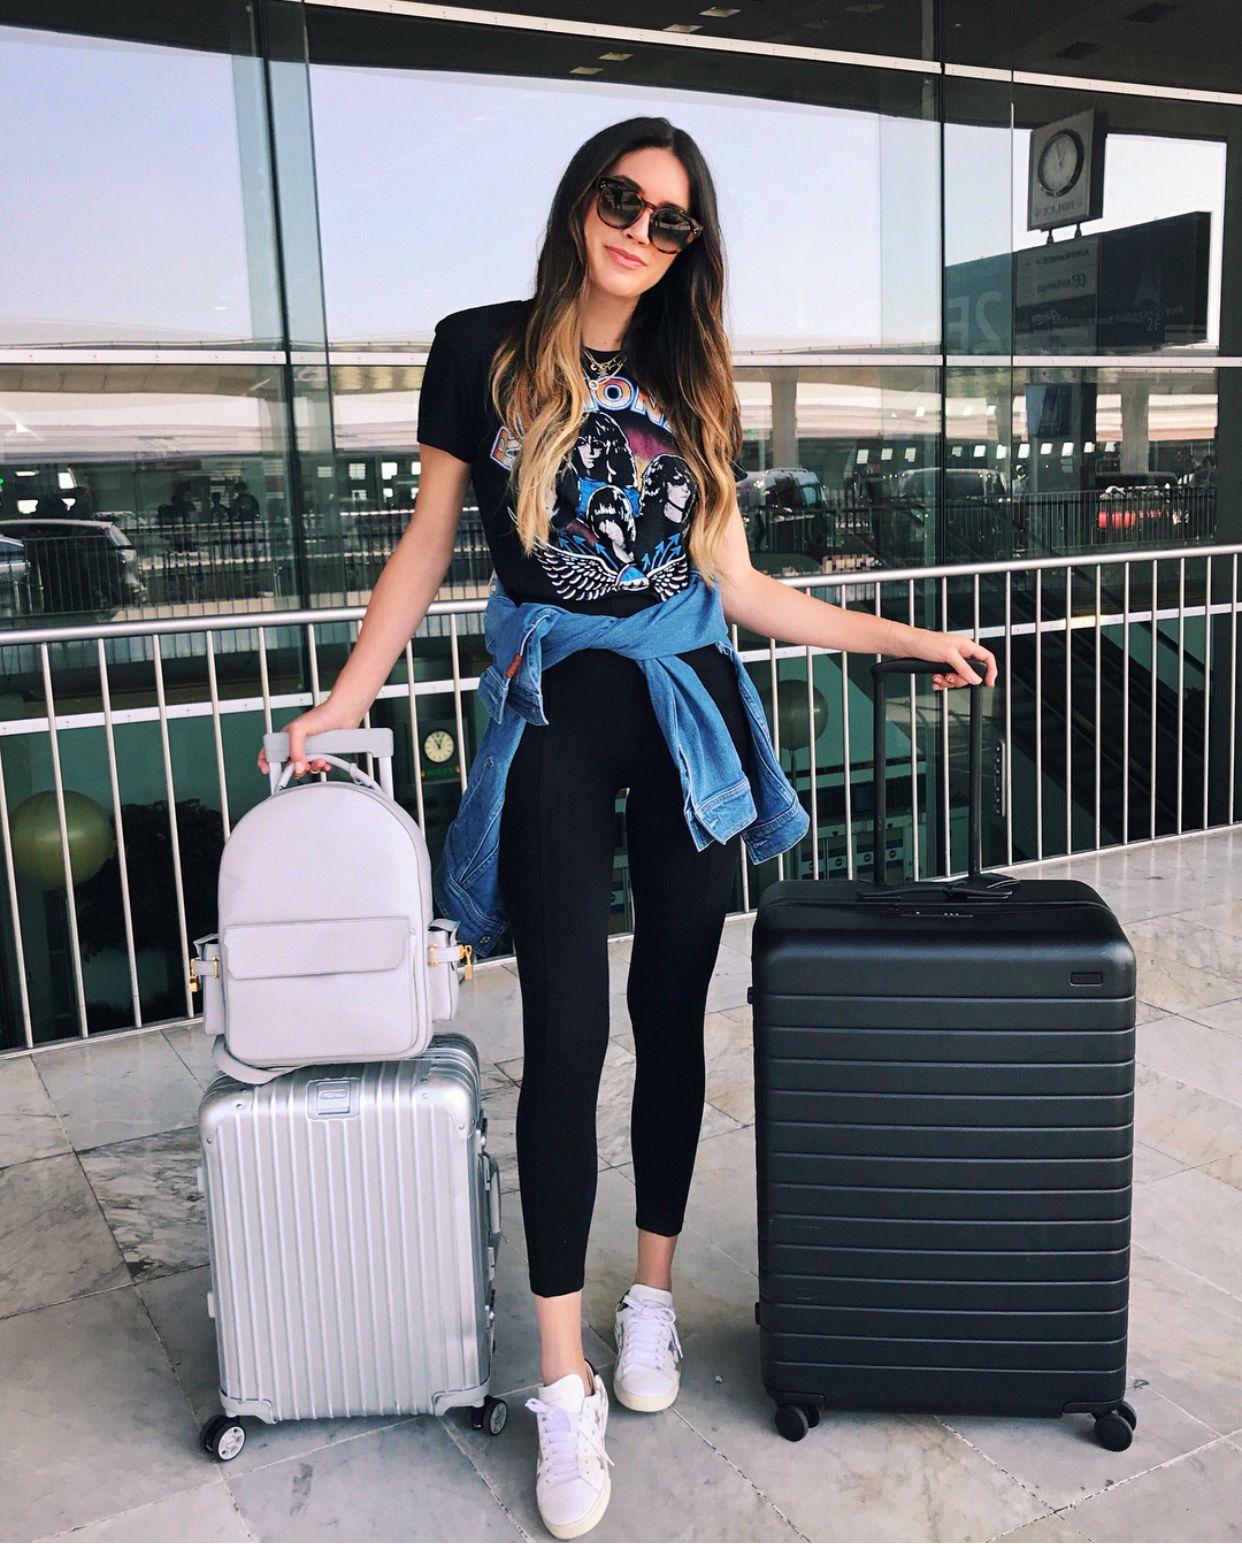 4422582992f9 Black rock-band t-shirt+black leggins+white sneakers+grey backpacks+denim  jacket+sunglasses+silver suitcase+black suitcase. Summer Travel Outfit 2017